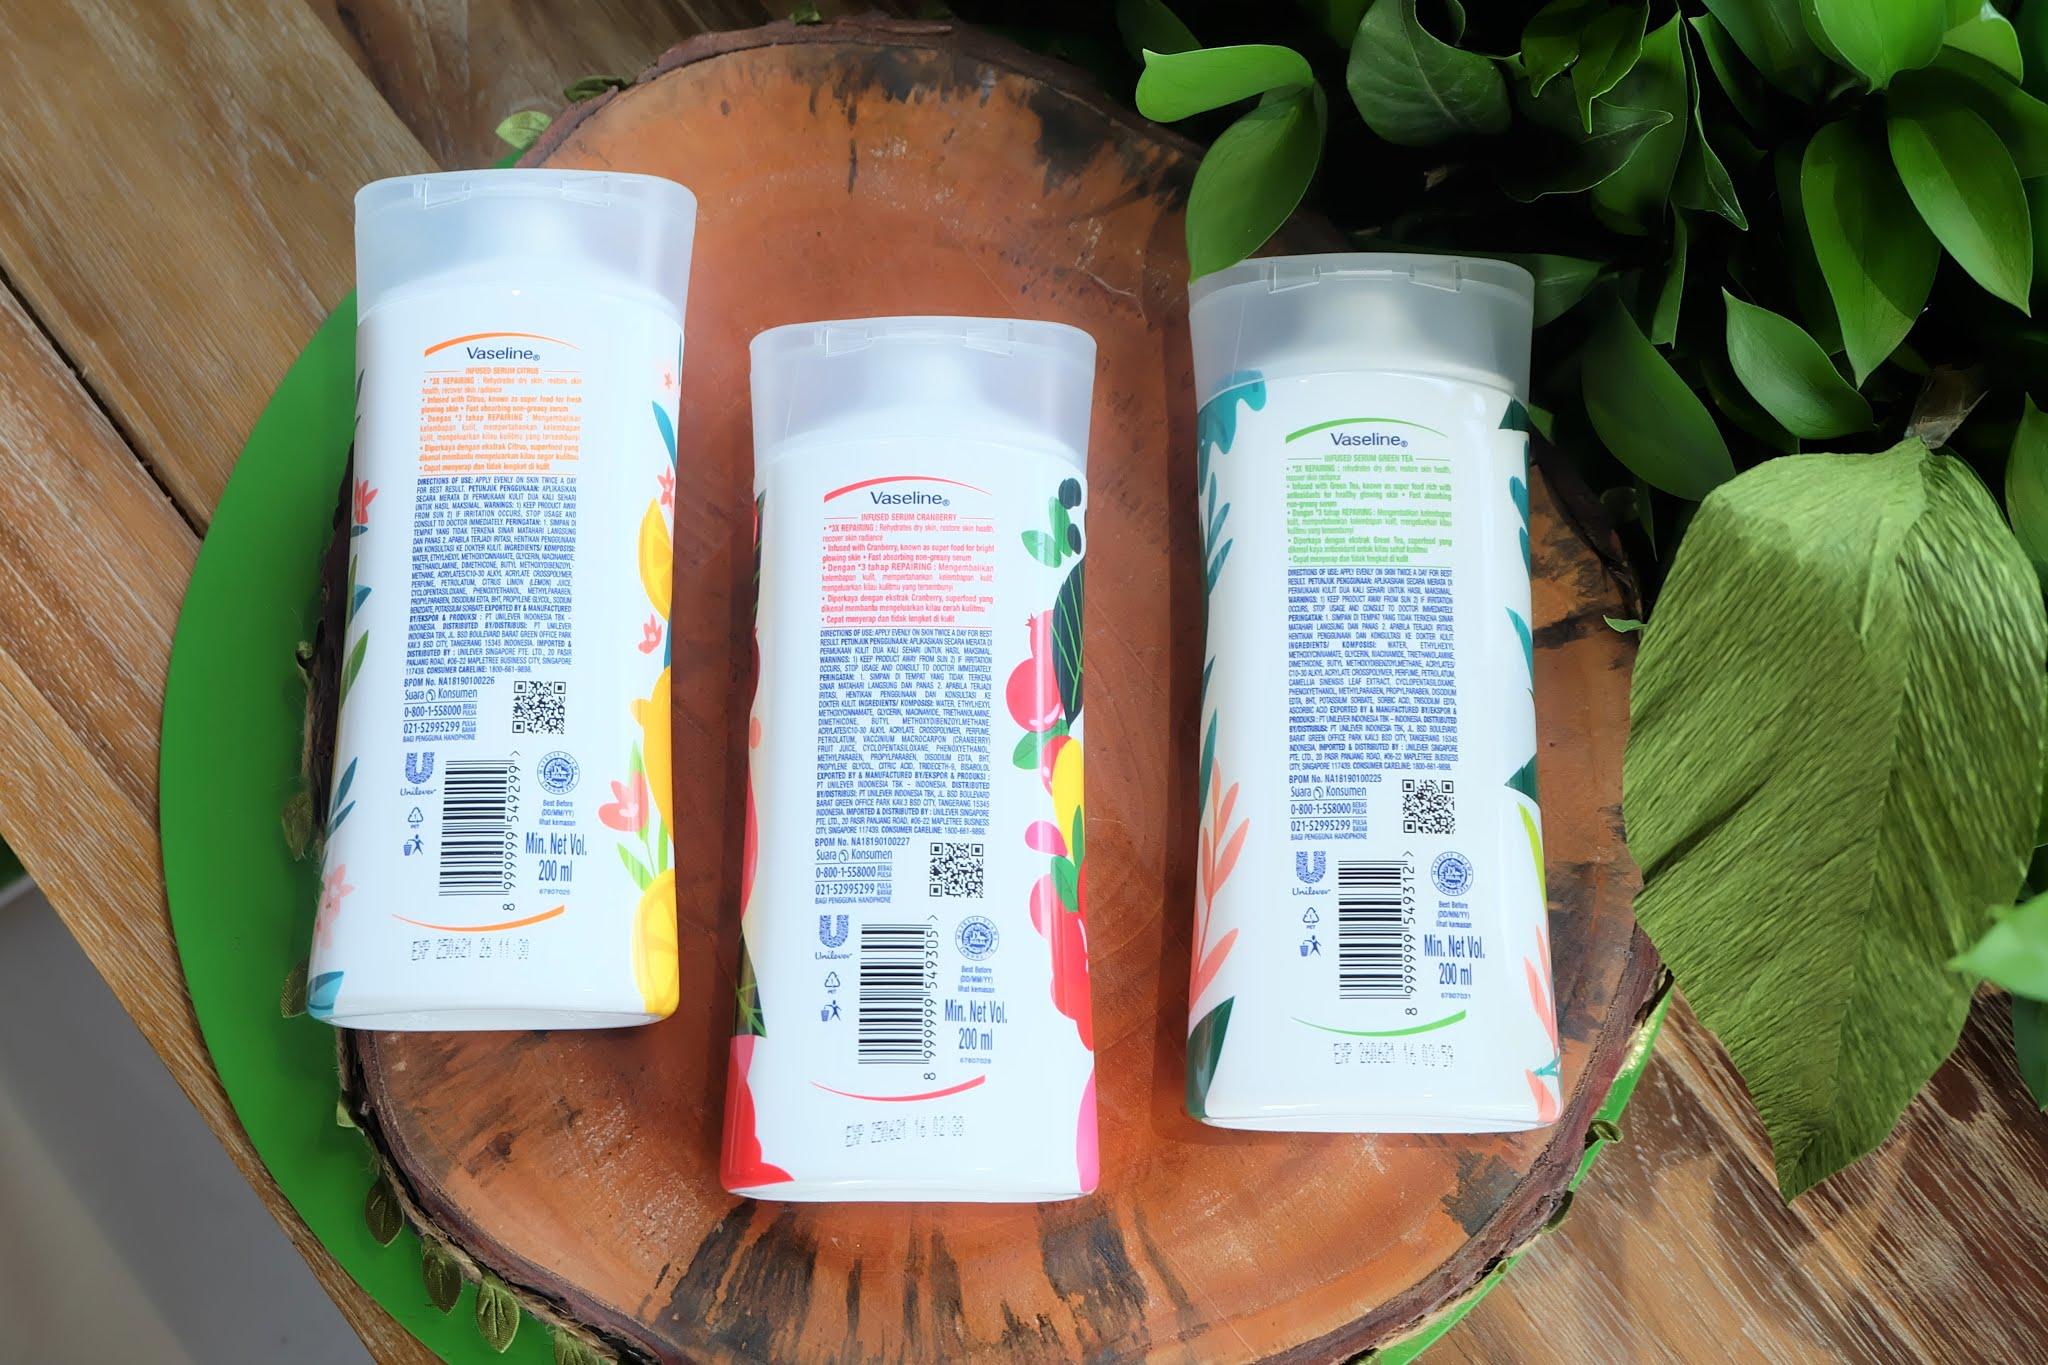 [Review] Vaseline Super Food Skin Serum